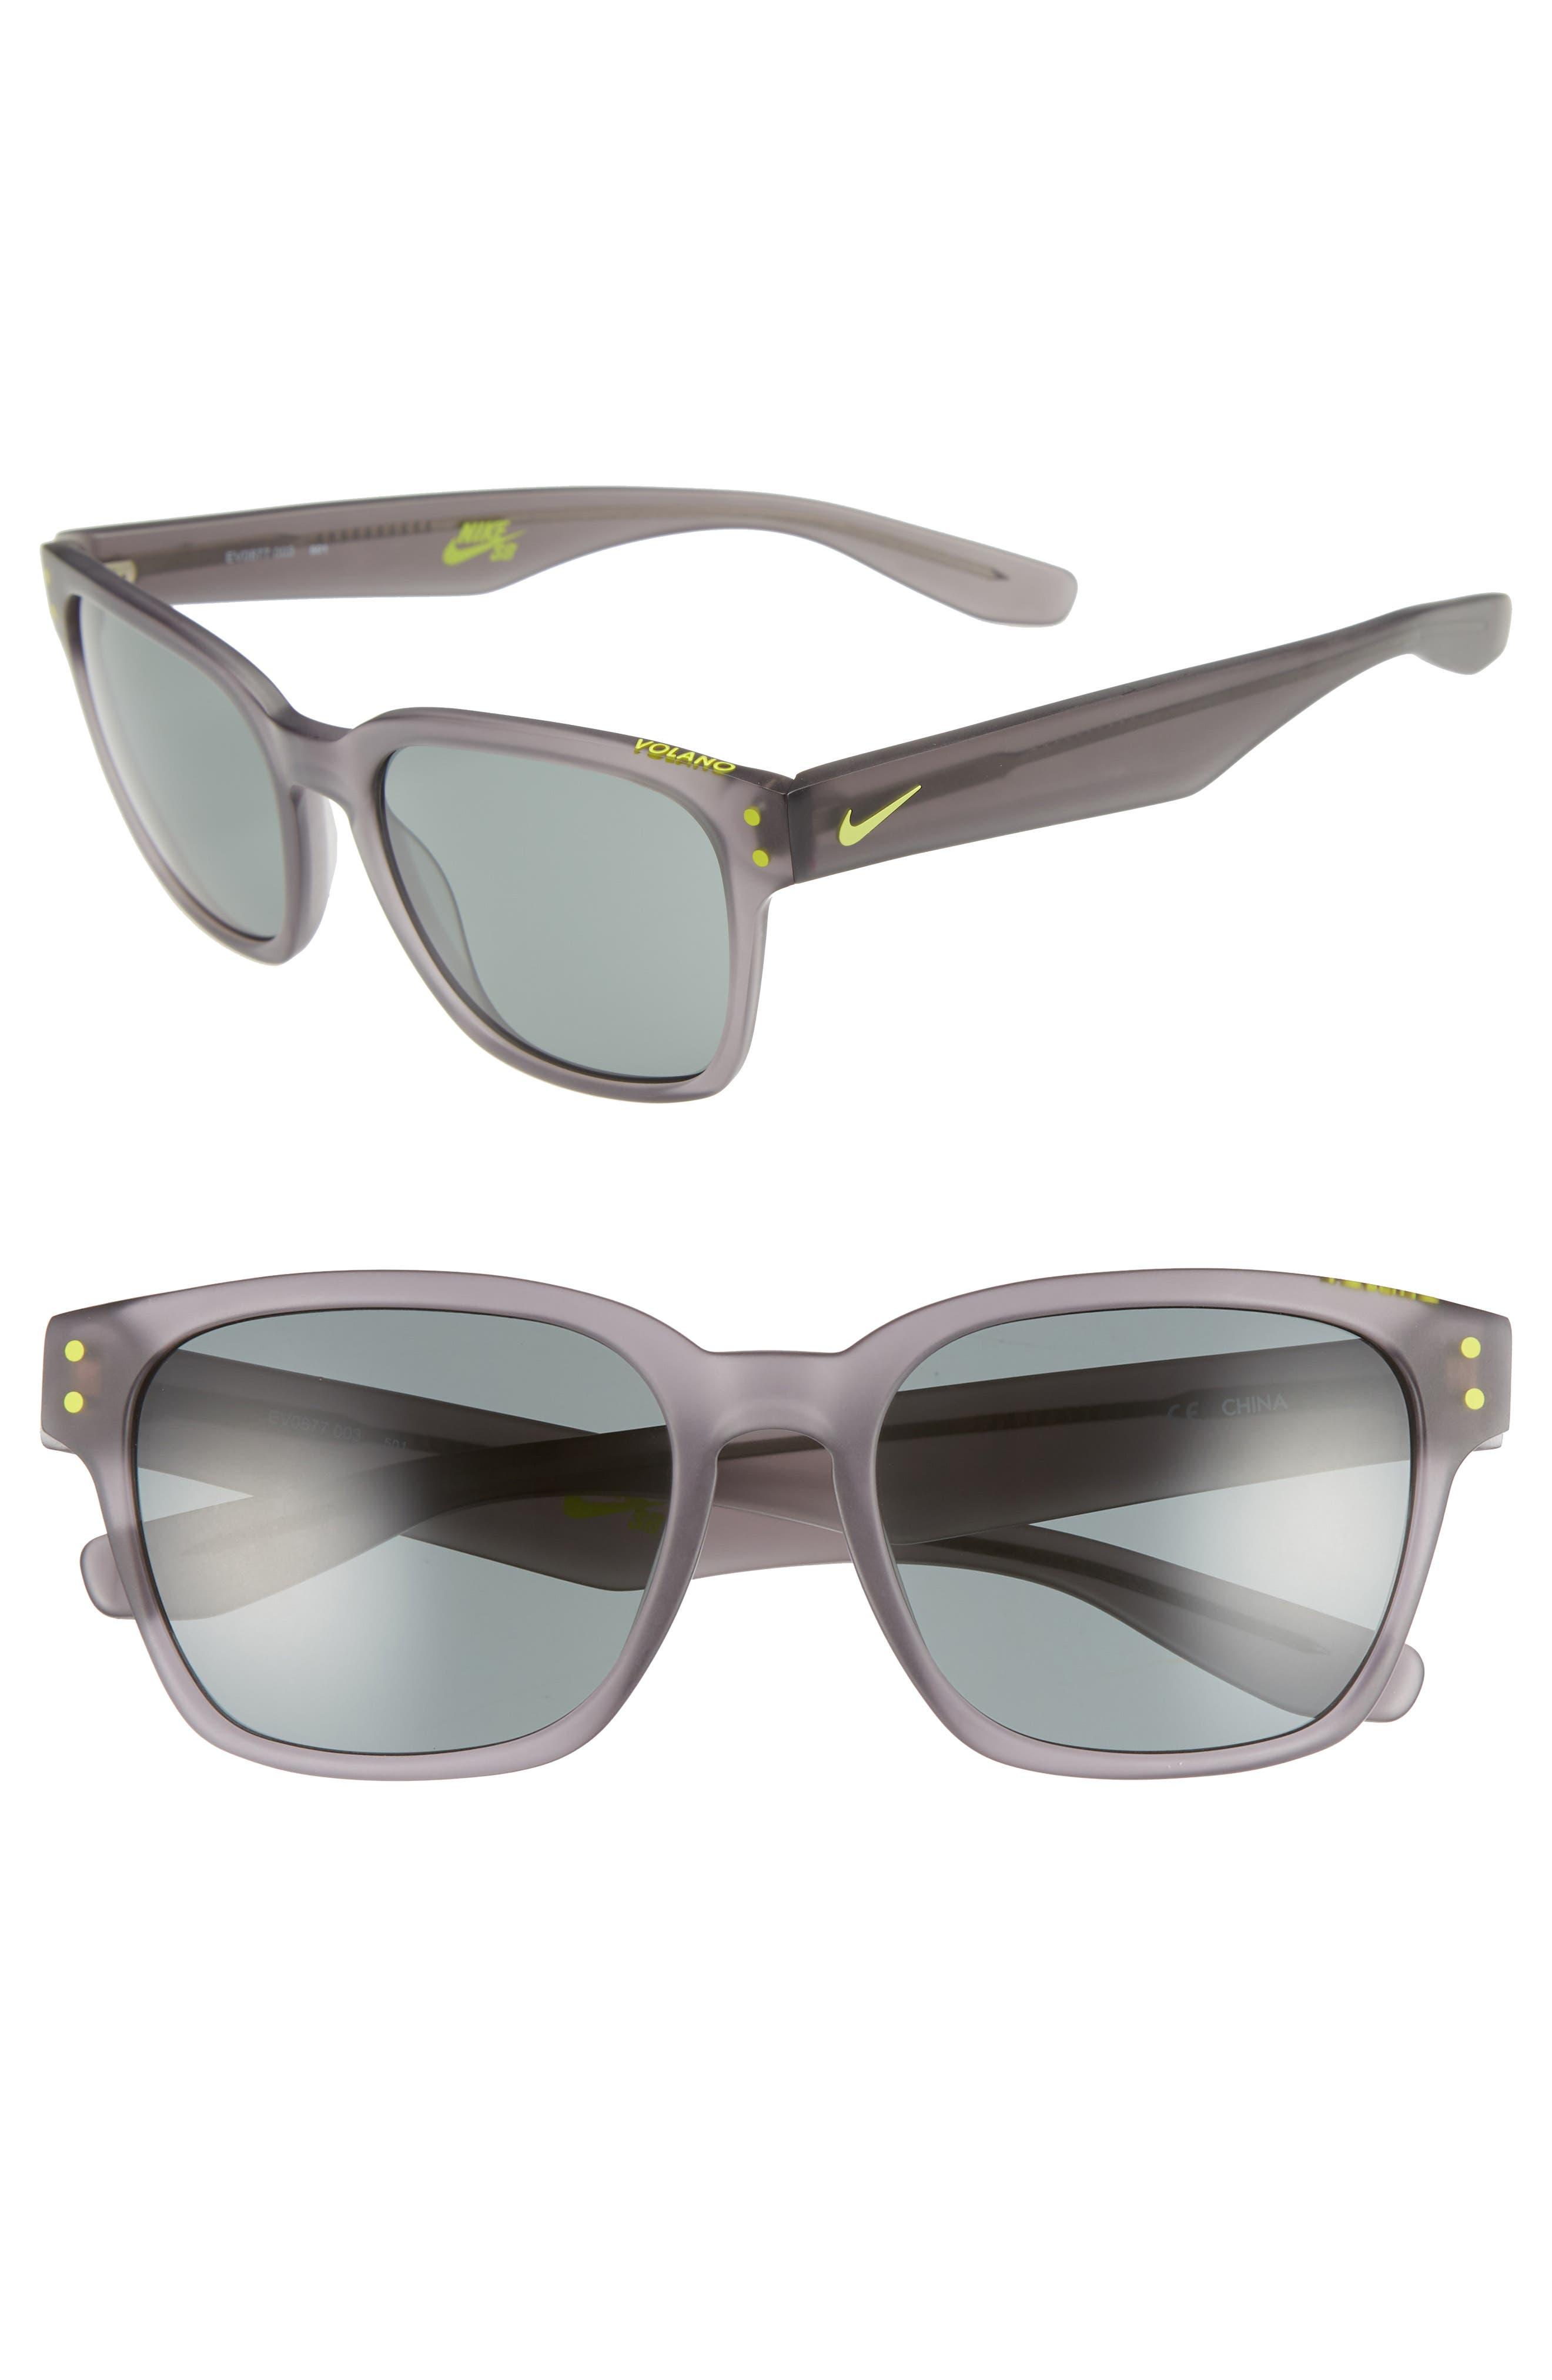 Nike Current 51Mm Sunglasses - Anthracite/ Gunmetal/ Green